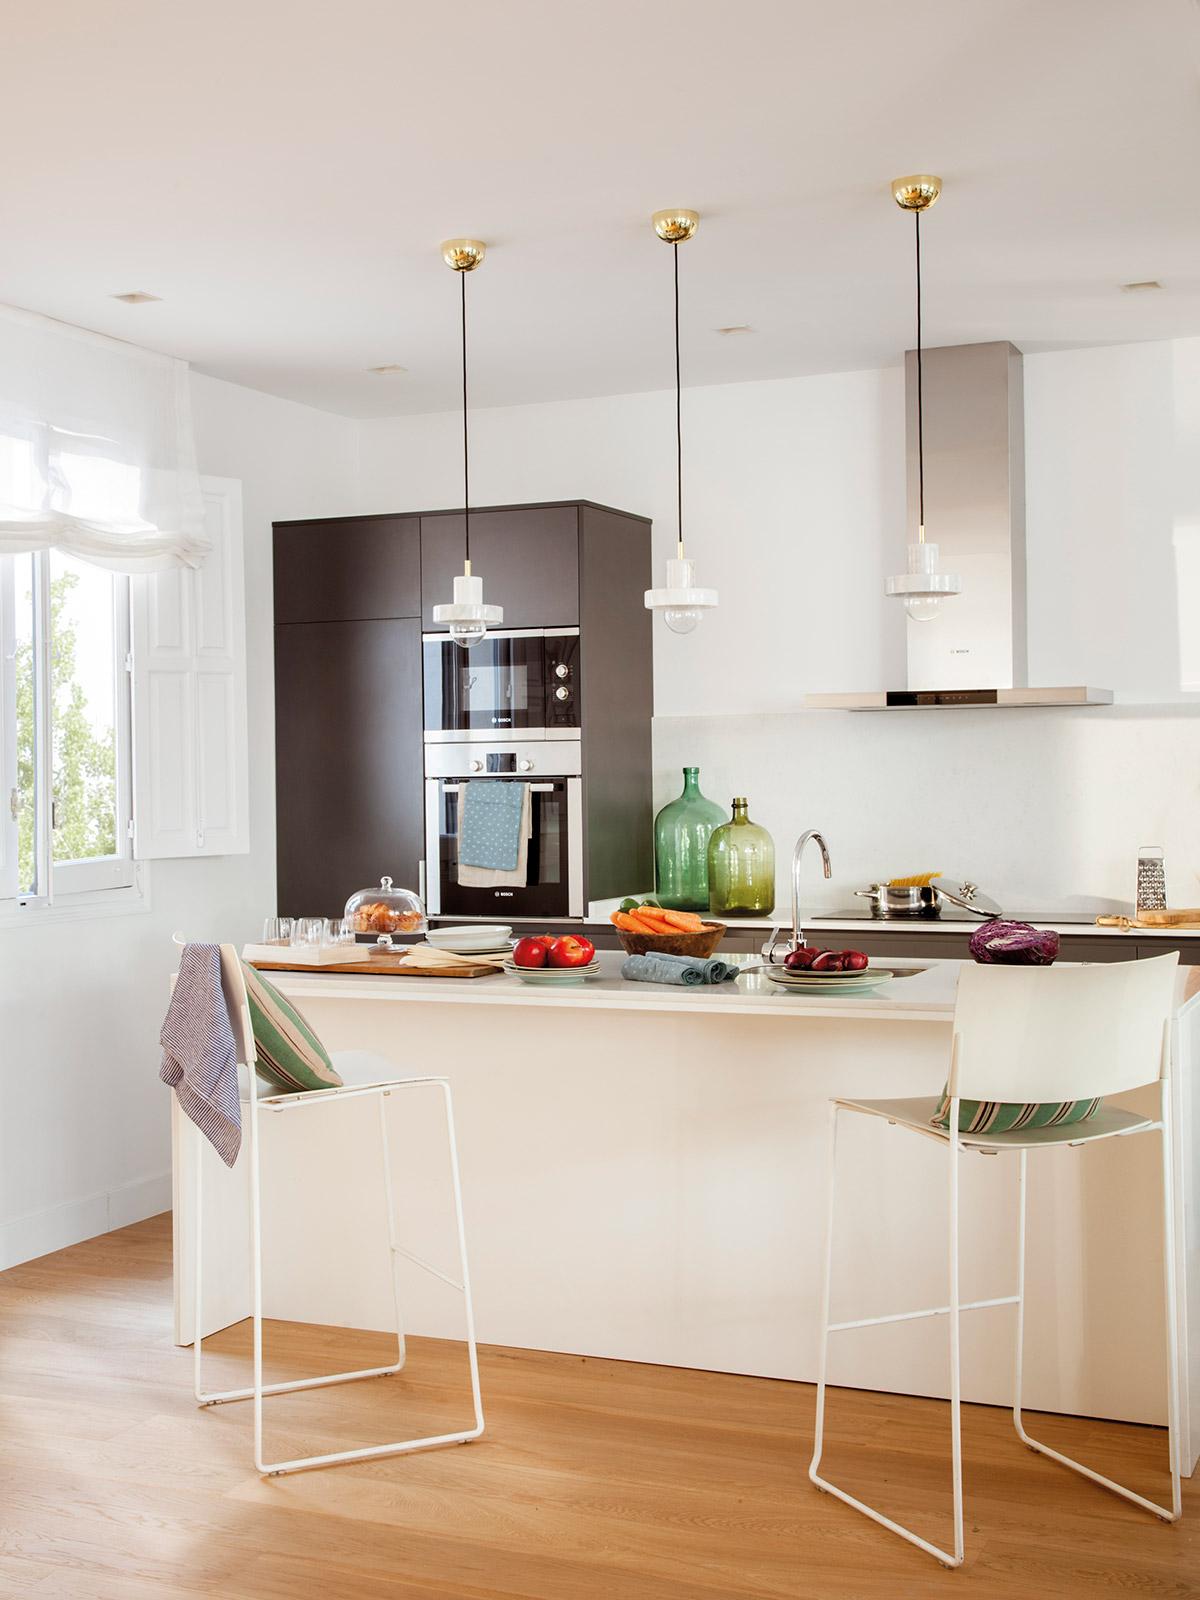 Dise o de una cocina con barra de desayuno Cocinas pequenas modernas con barra